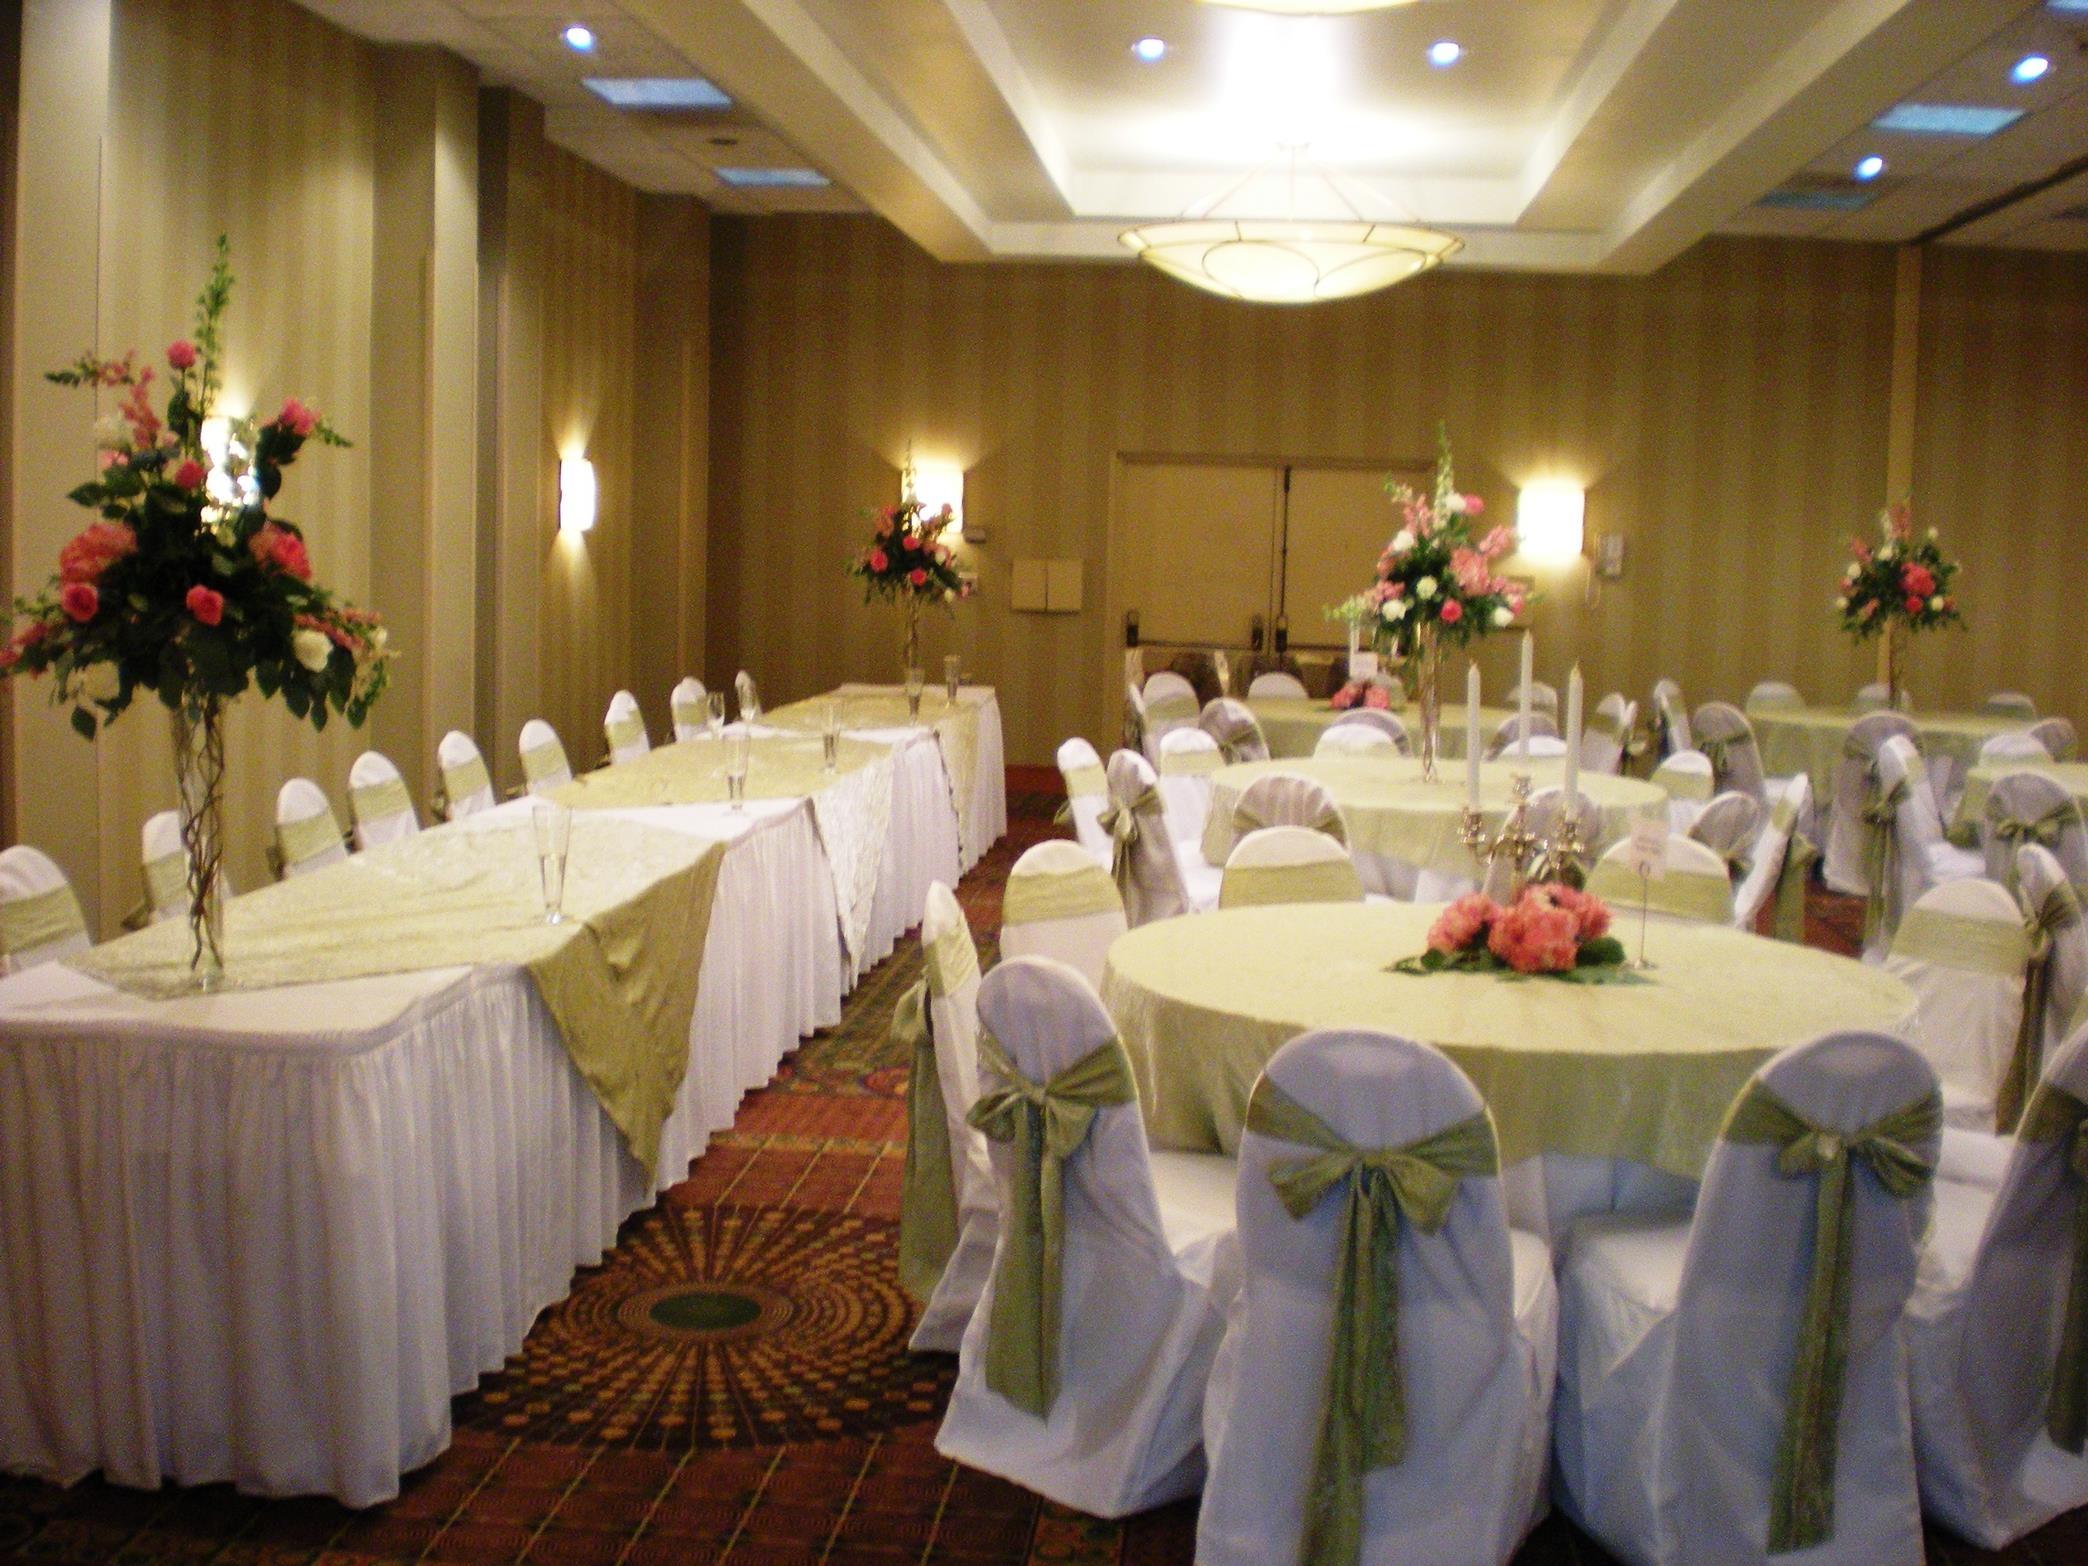 DoubleTree by Hilton Hotel Oak Ridge - Knoxville image 17